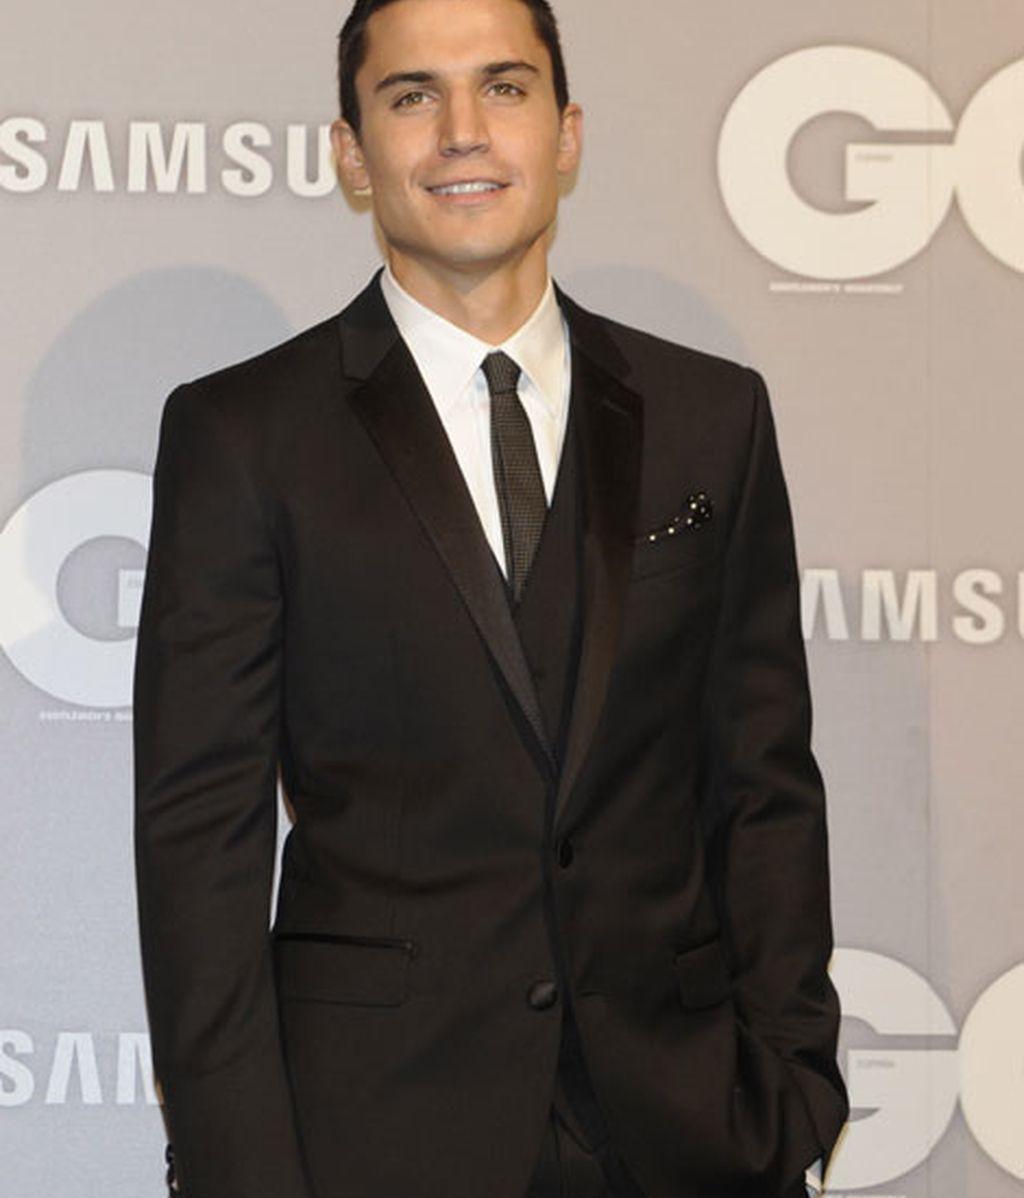 Gala GQ Hombres del Año 2013